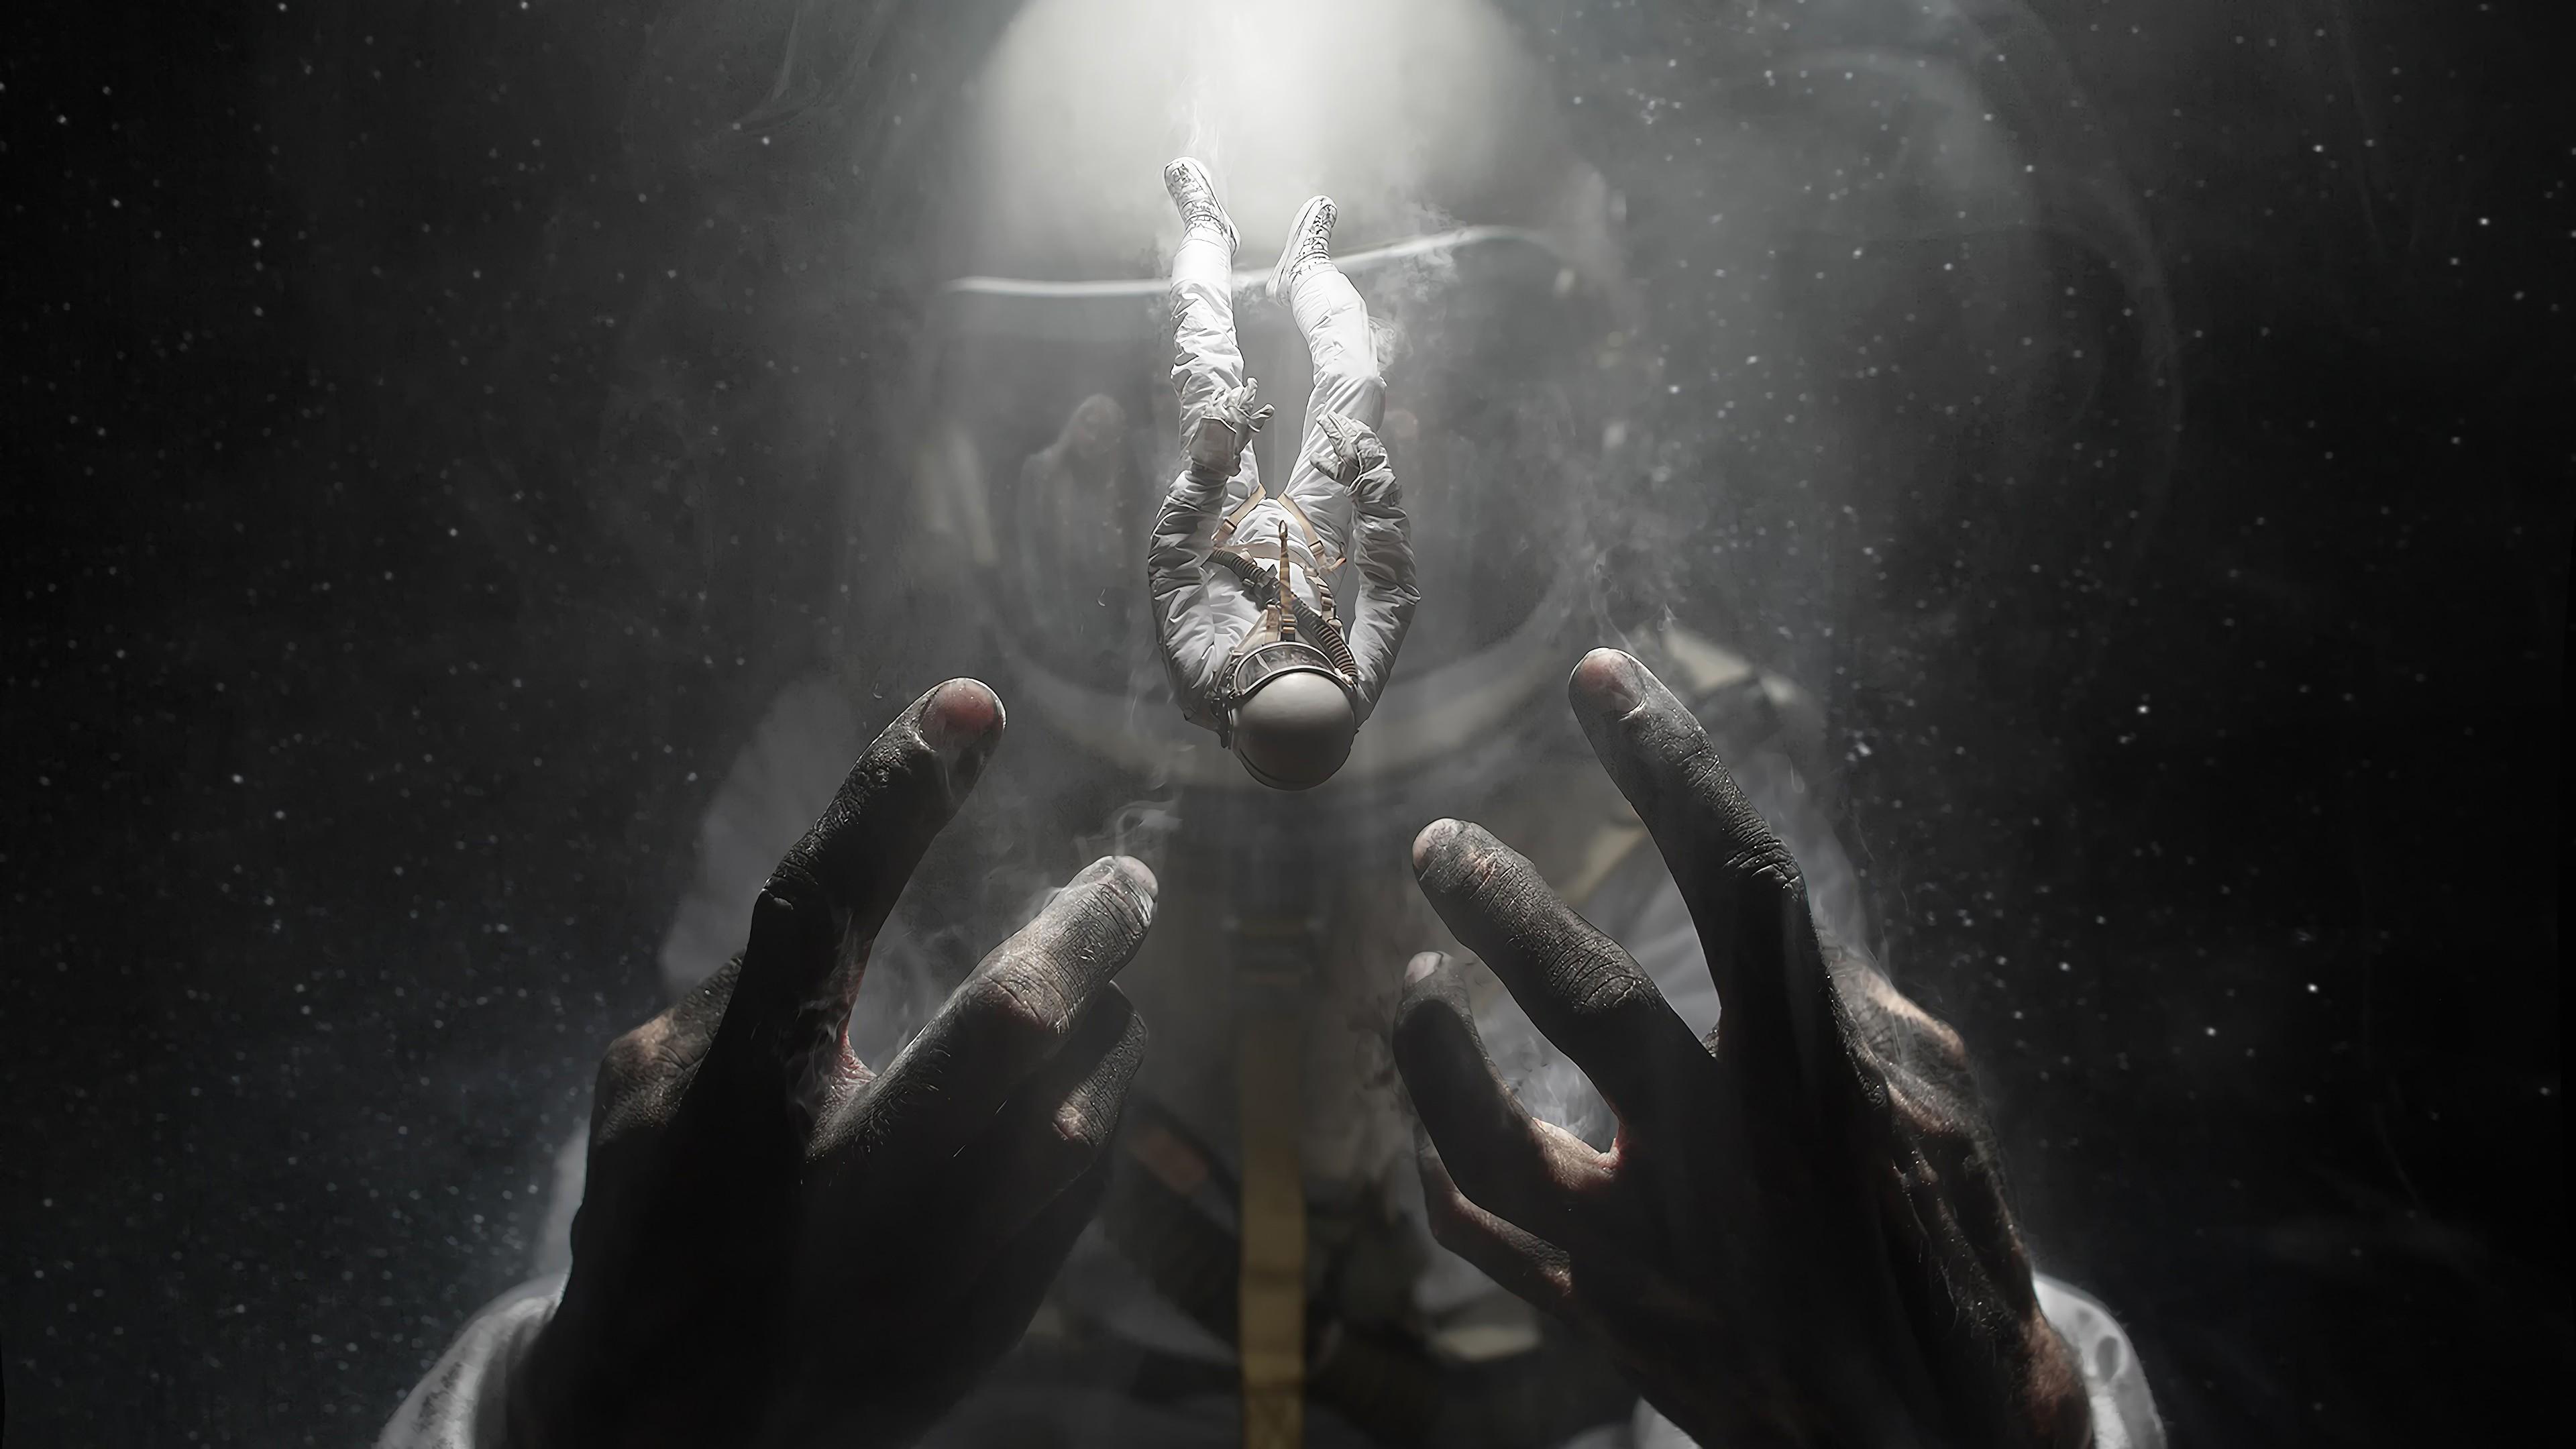 General 3840x2160 digital digital art artwork fantasy art astronaut spacesuit space space art giant fictional people falling dark lights hands environment concept art